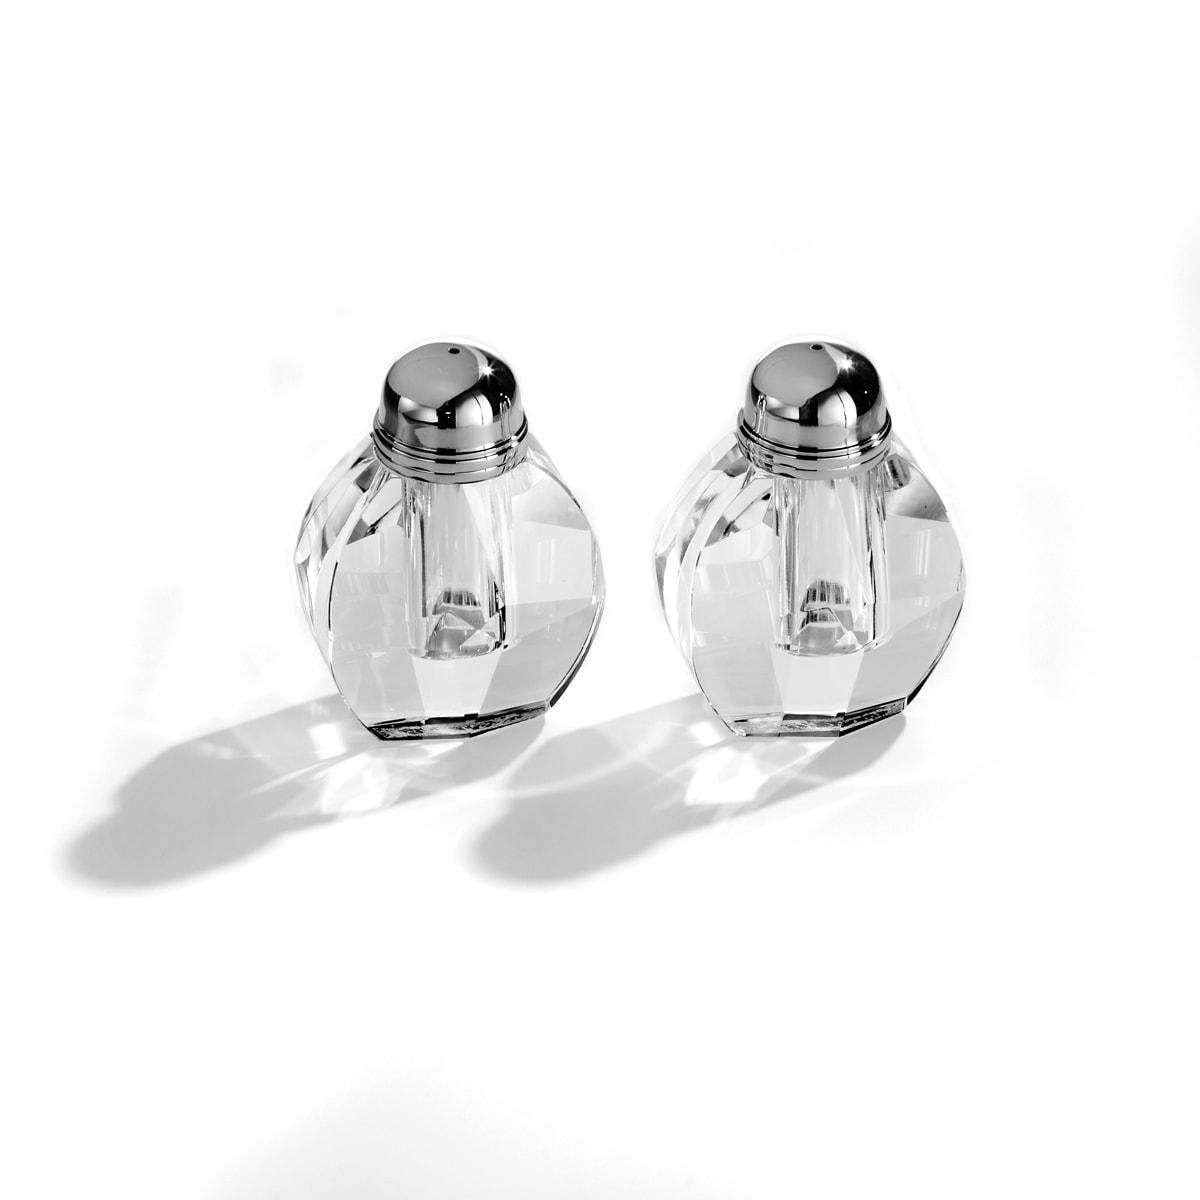 Fifth Avenue Crystal 'Reflections' 2-Piece Salt/ Pepper Shaker Set